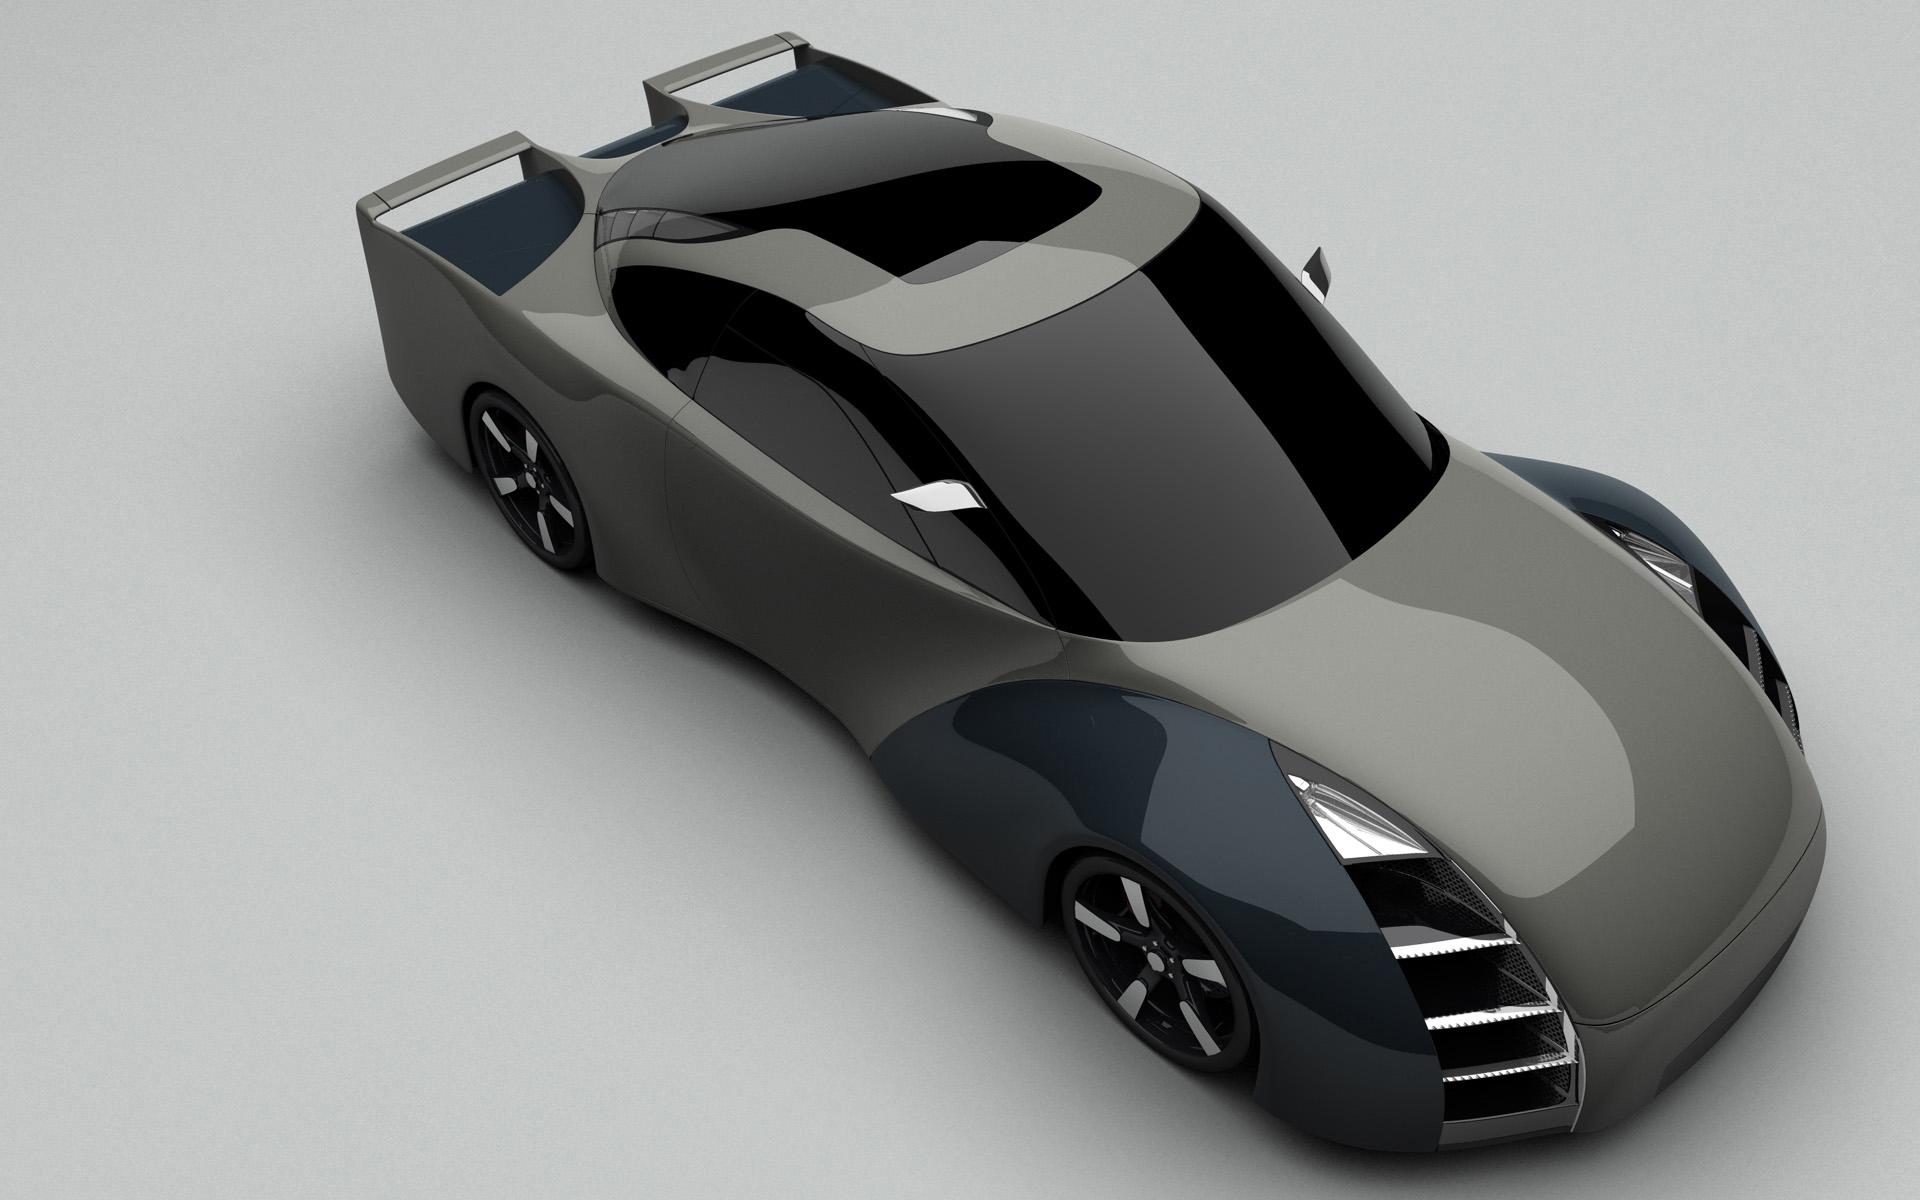 Ronin Concept 3 by AerosolFun